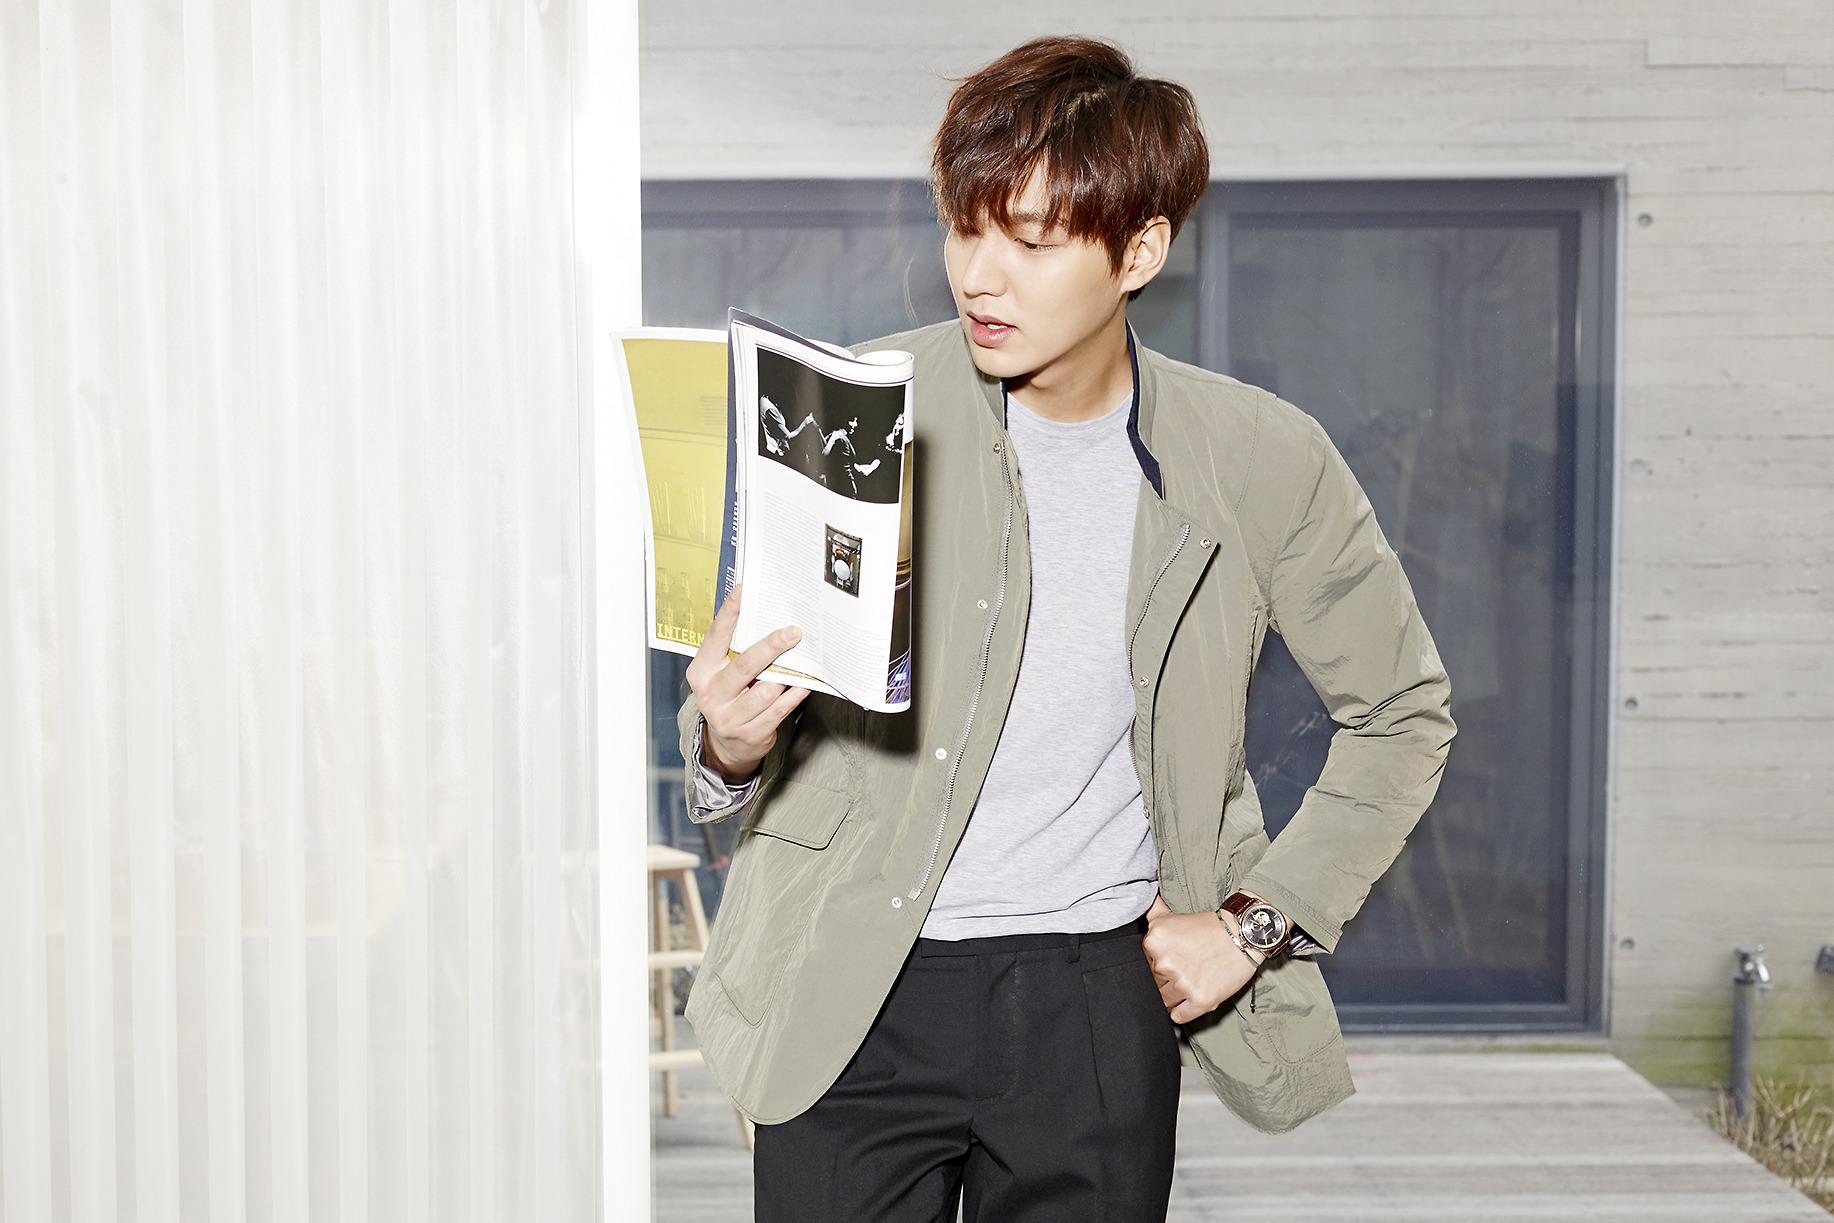 Google themes lee min ho - Google Themes Lee Min Ho 26